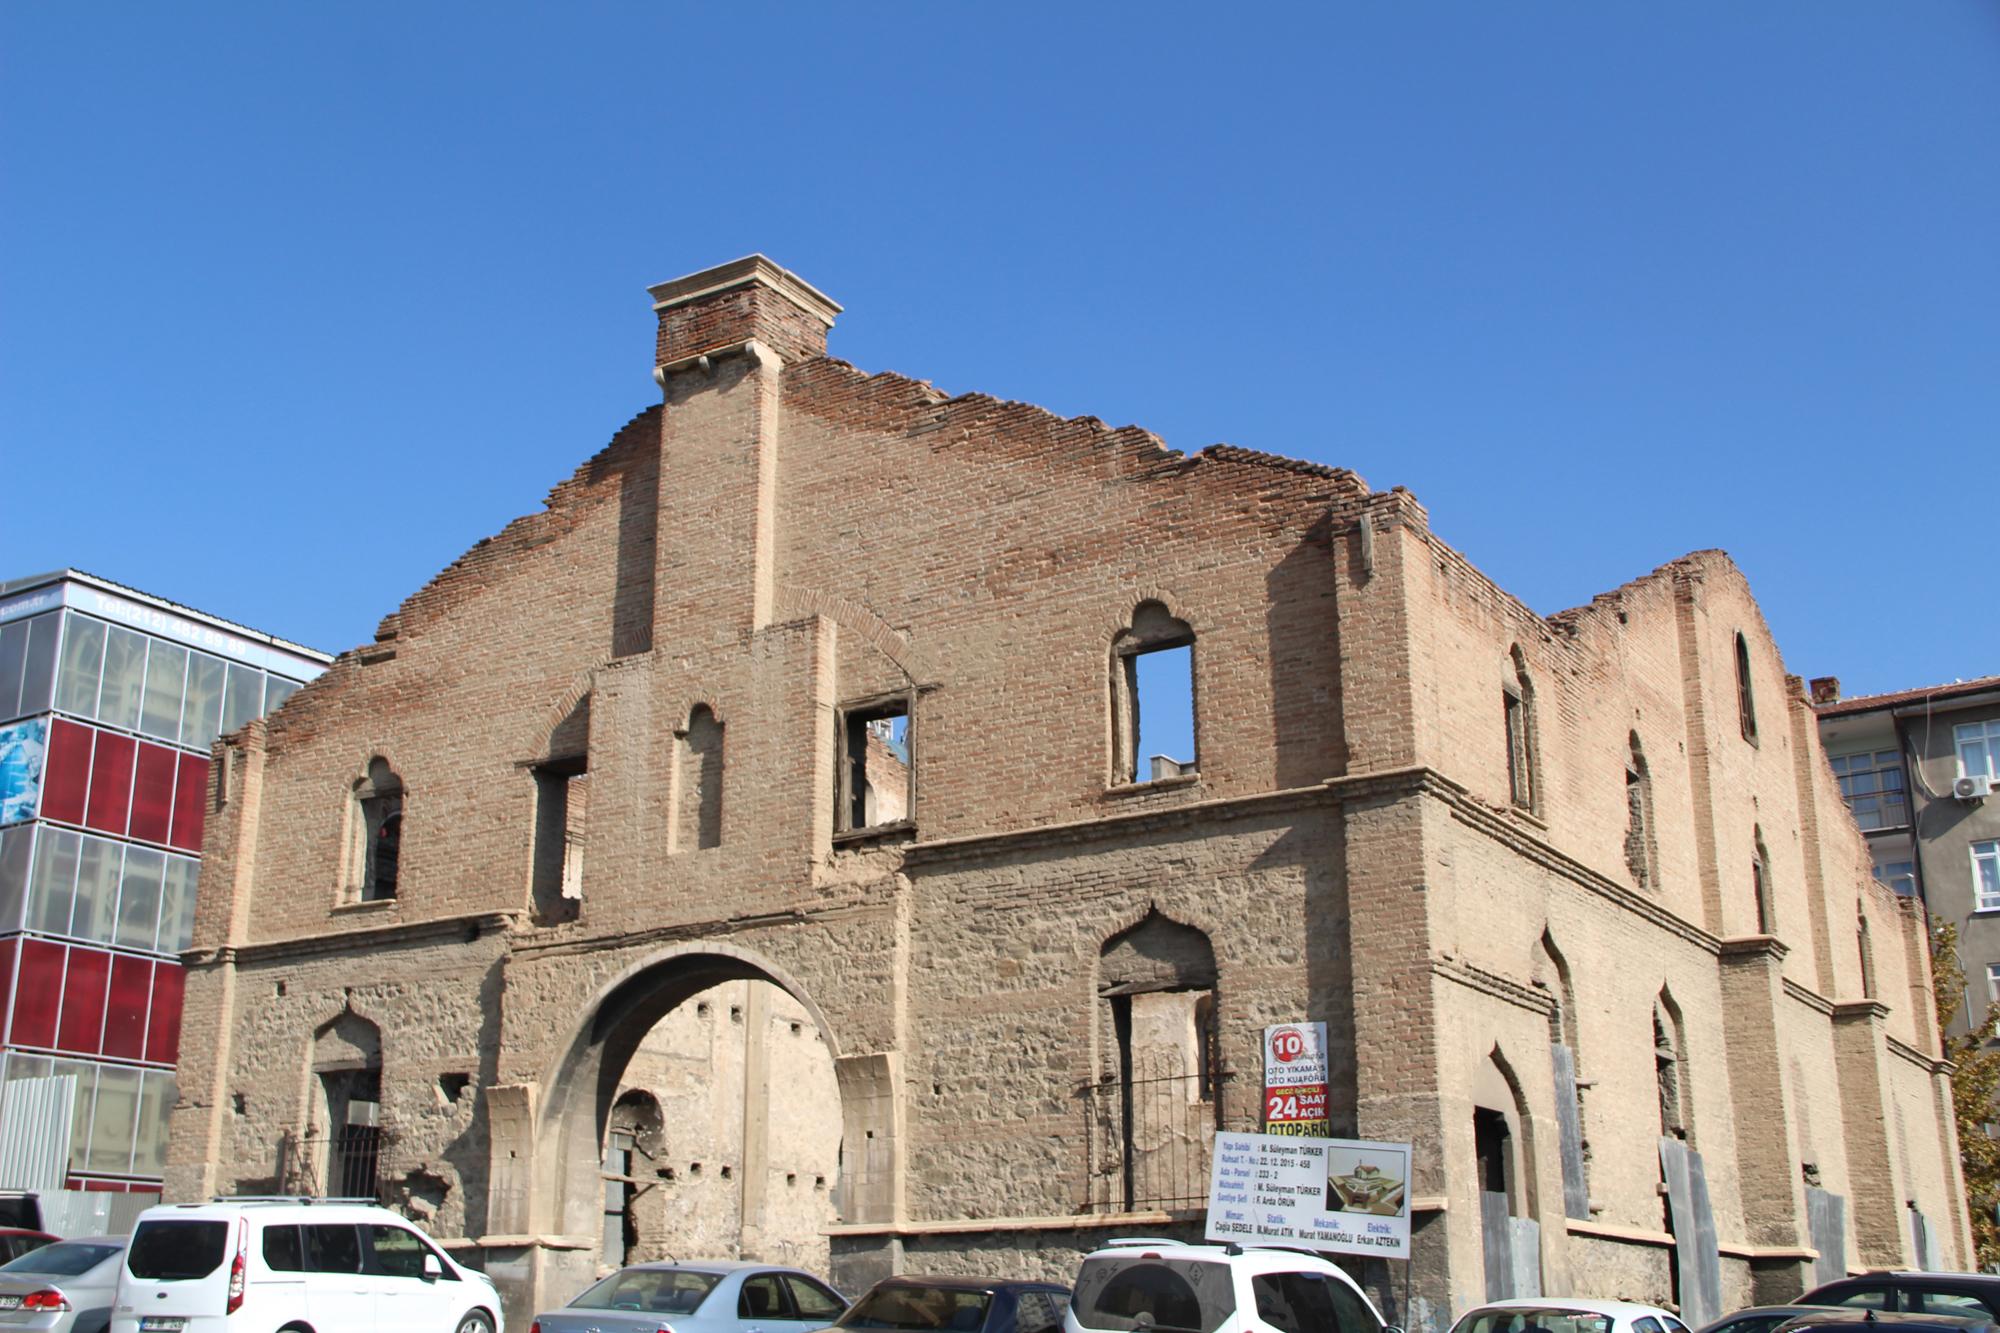 tarihi-kilise-icin-restorasyon-cikmazi_6003_dhaphoto6